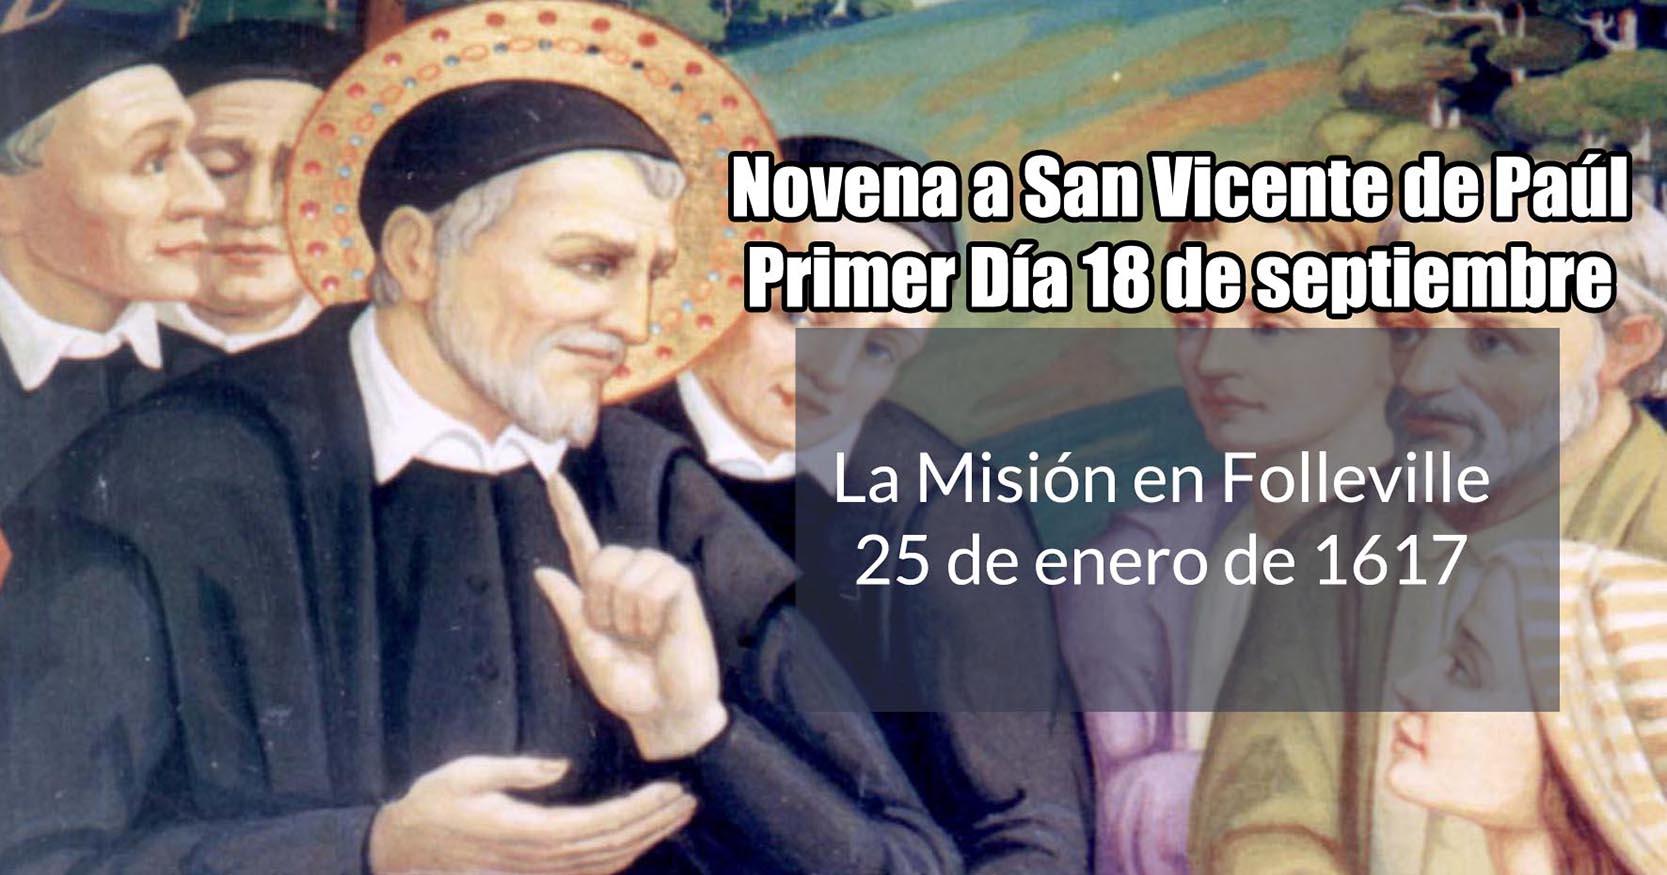 Novena a San Vicente de Paúl: Primer Día